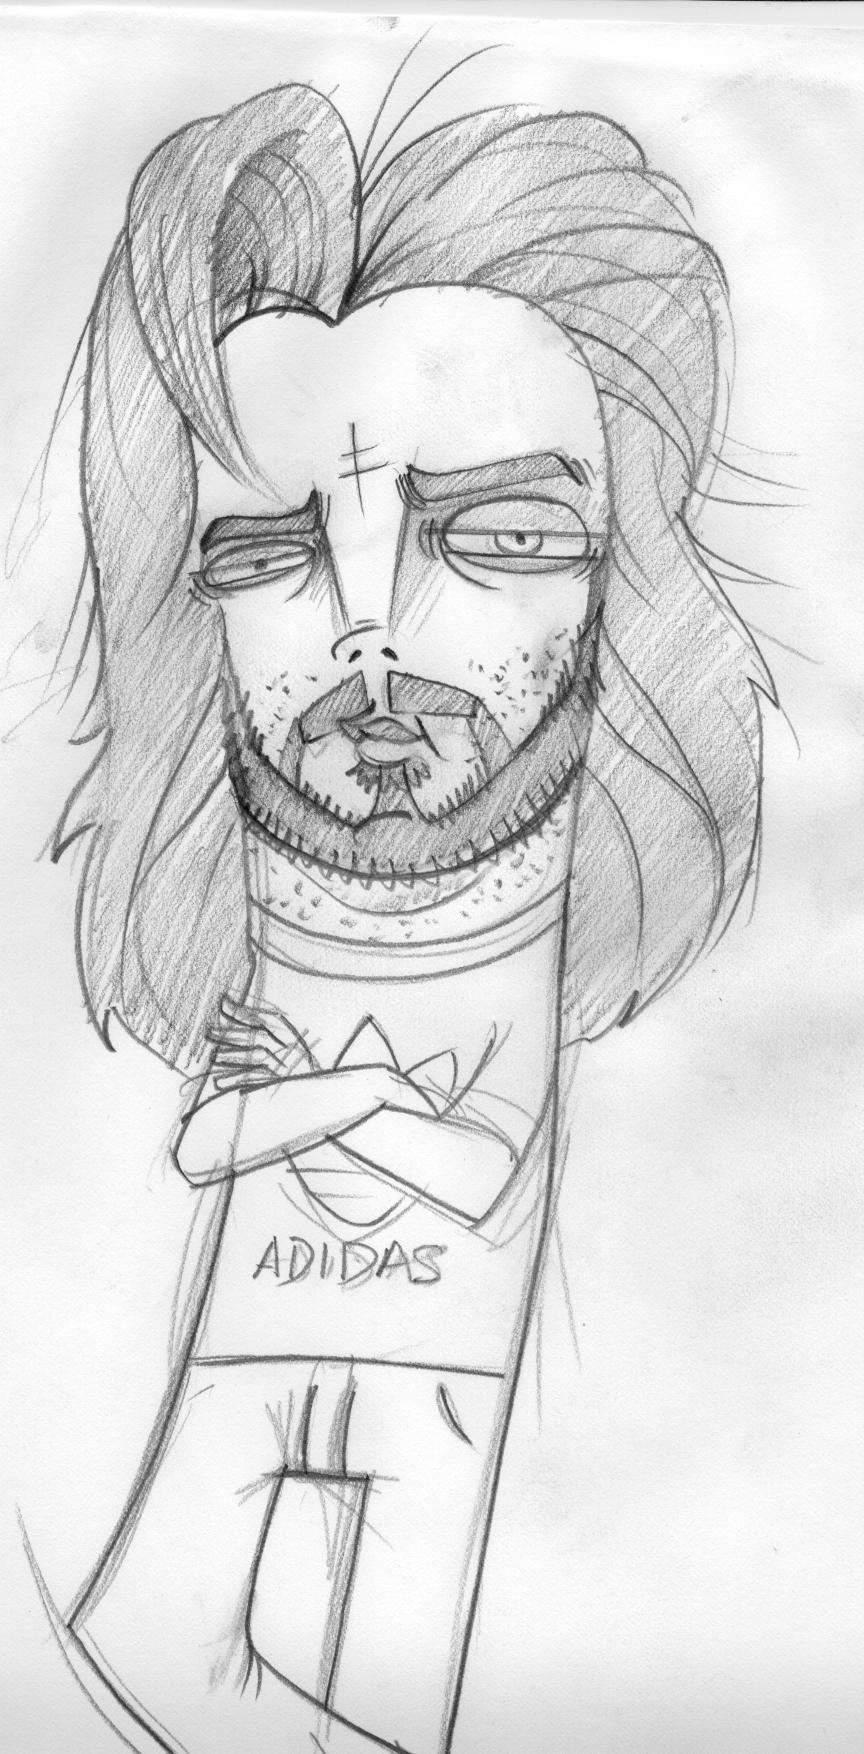 RickRubin_Sketch5.png